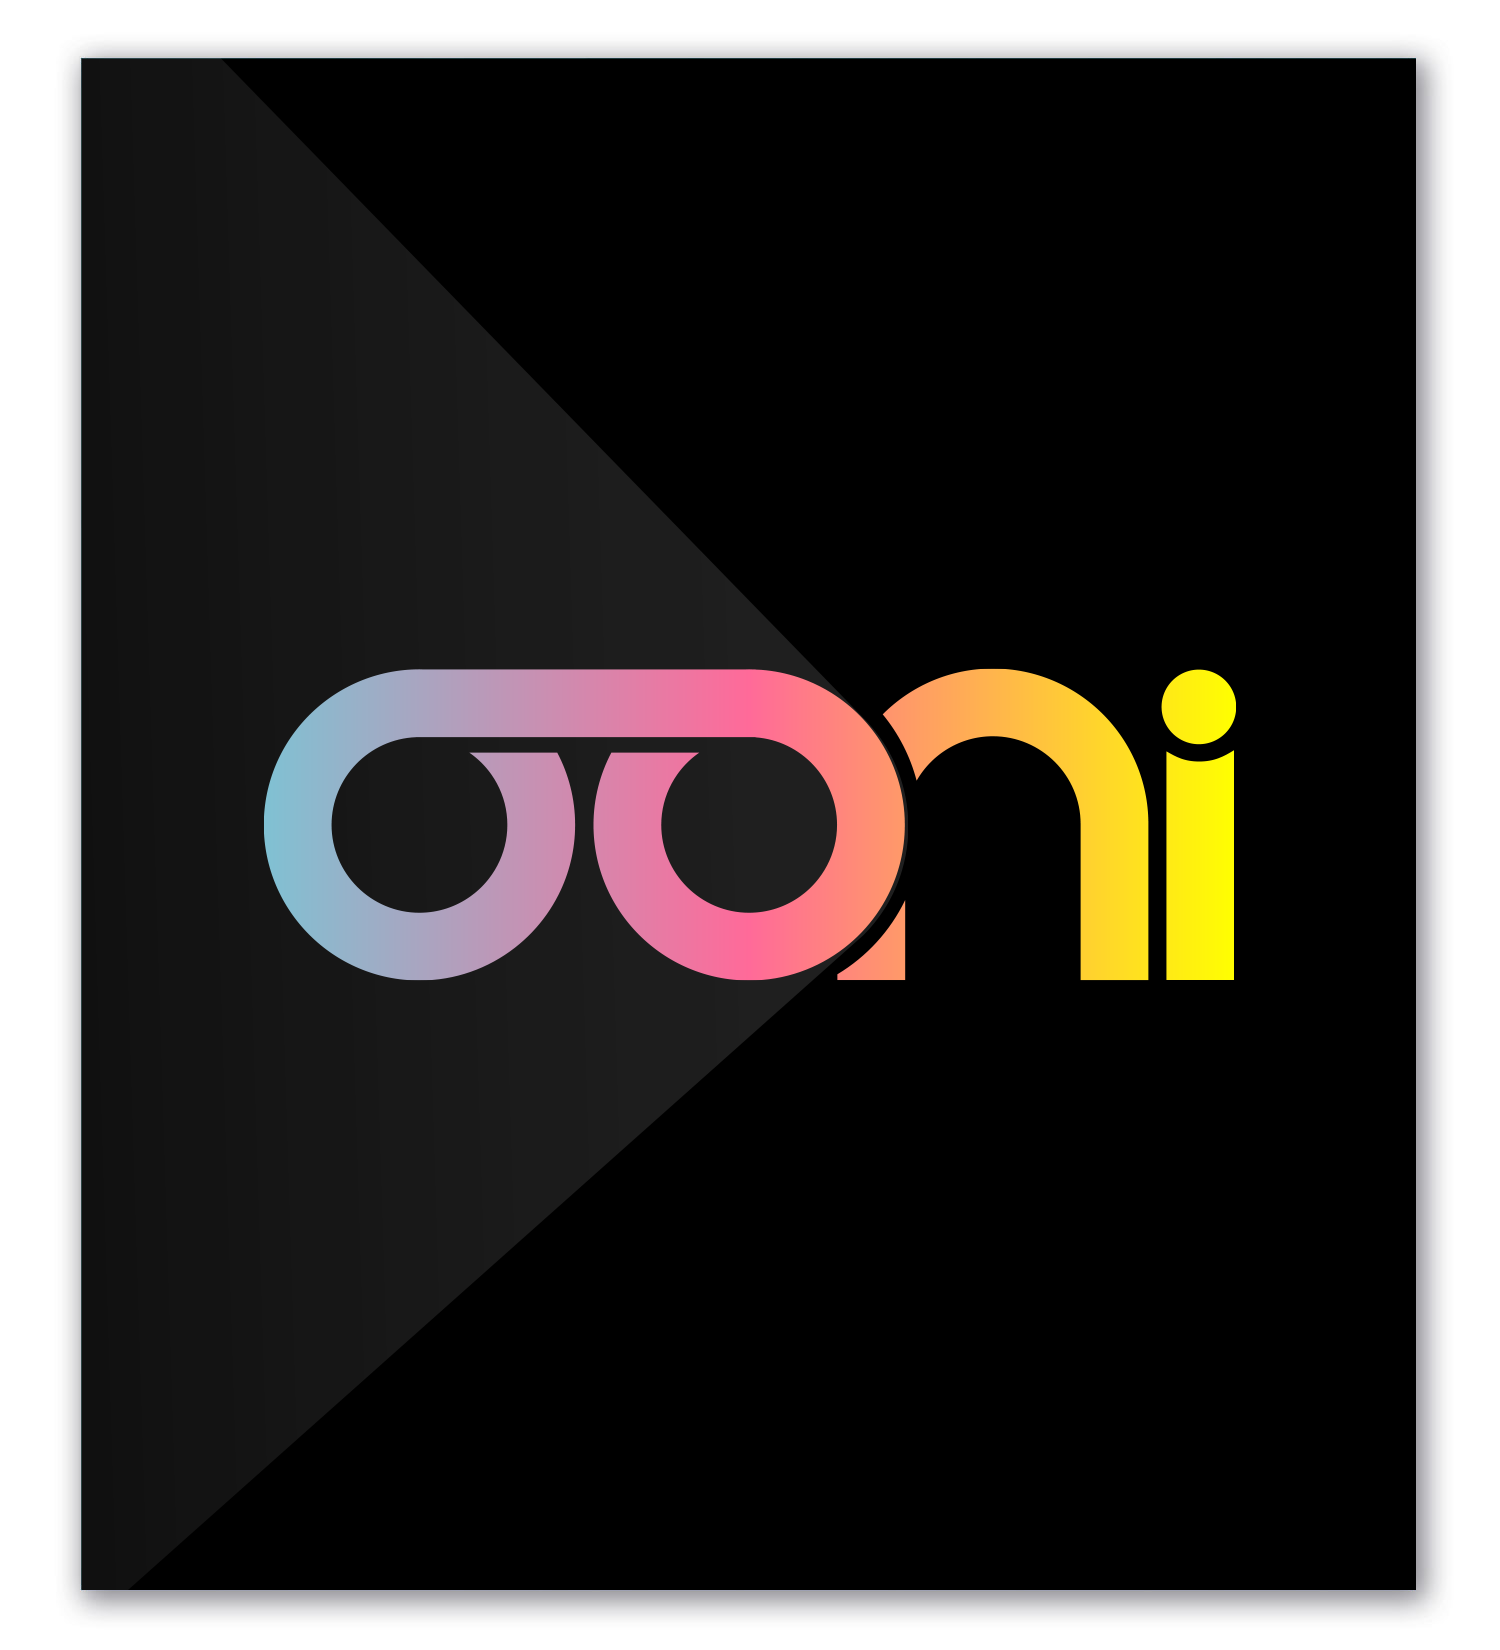 Ooni-Logo-Image